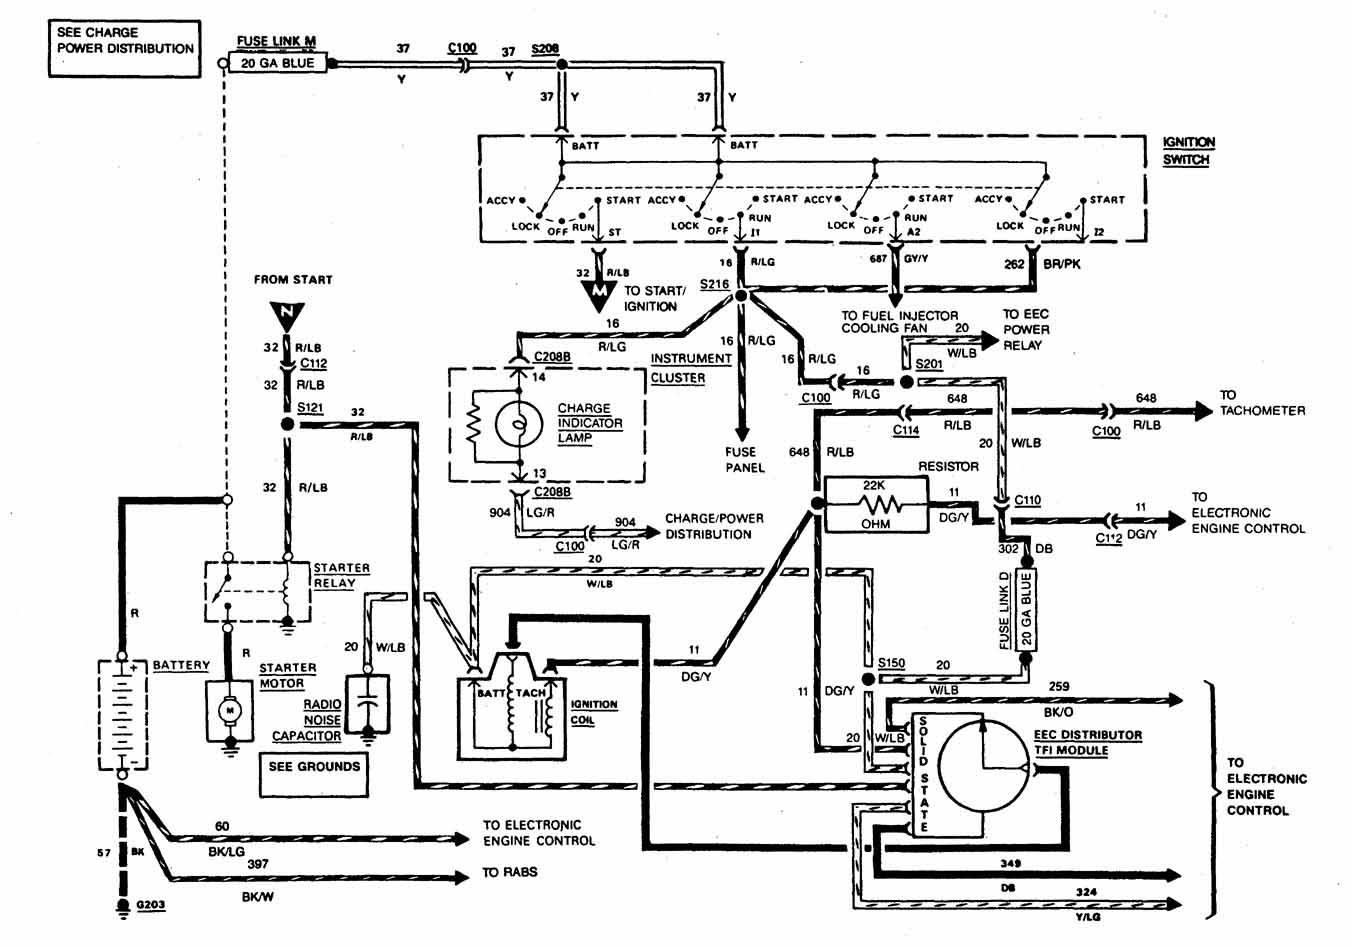 1989 Ford Bronco Electrical Diagrams Kawasaki Fj180v Engine Diagram Begeboy Wiring Diagram Source